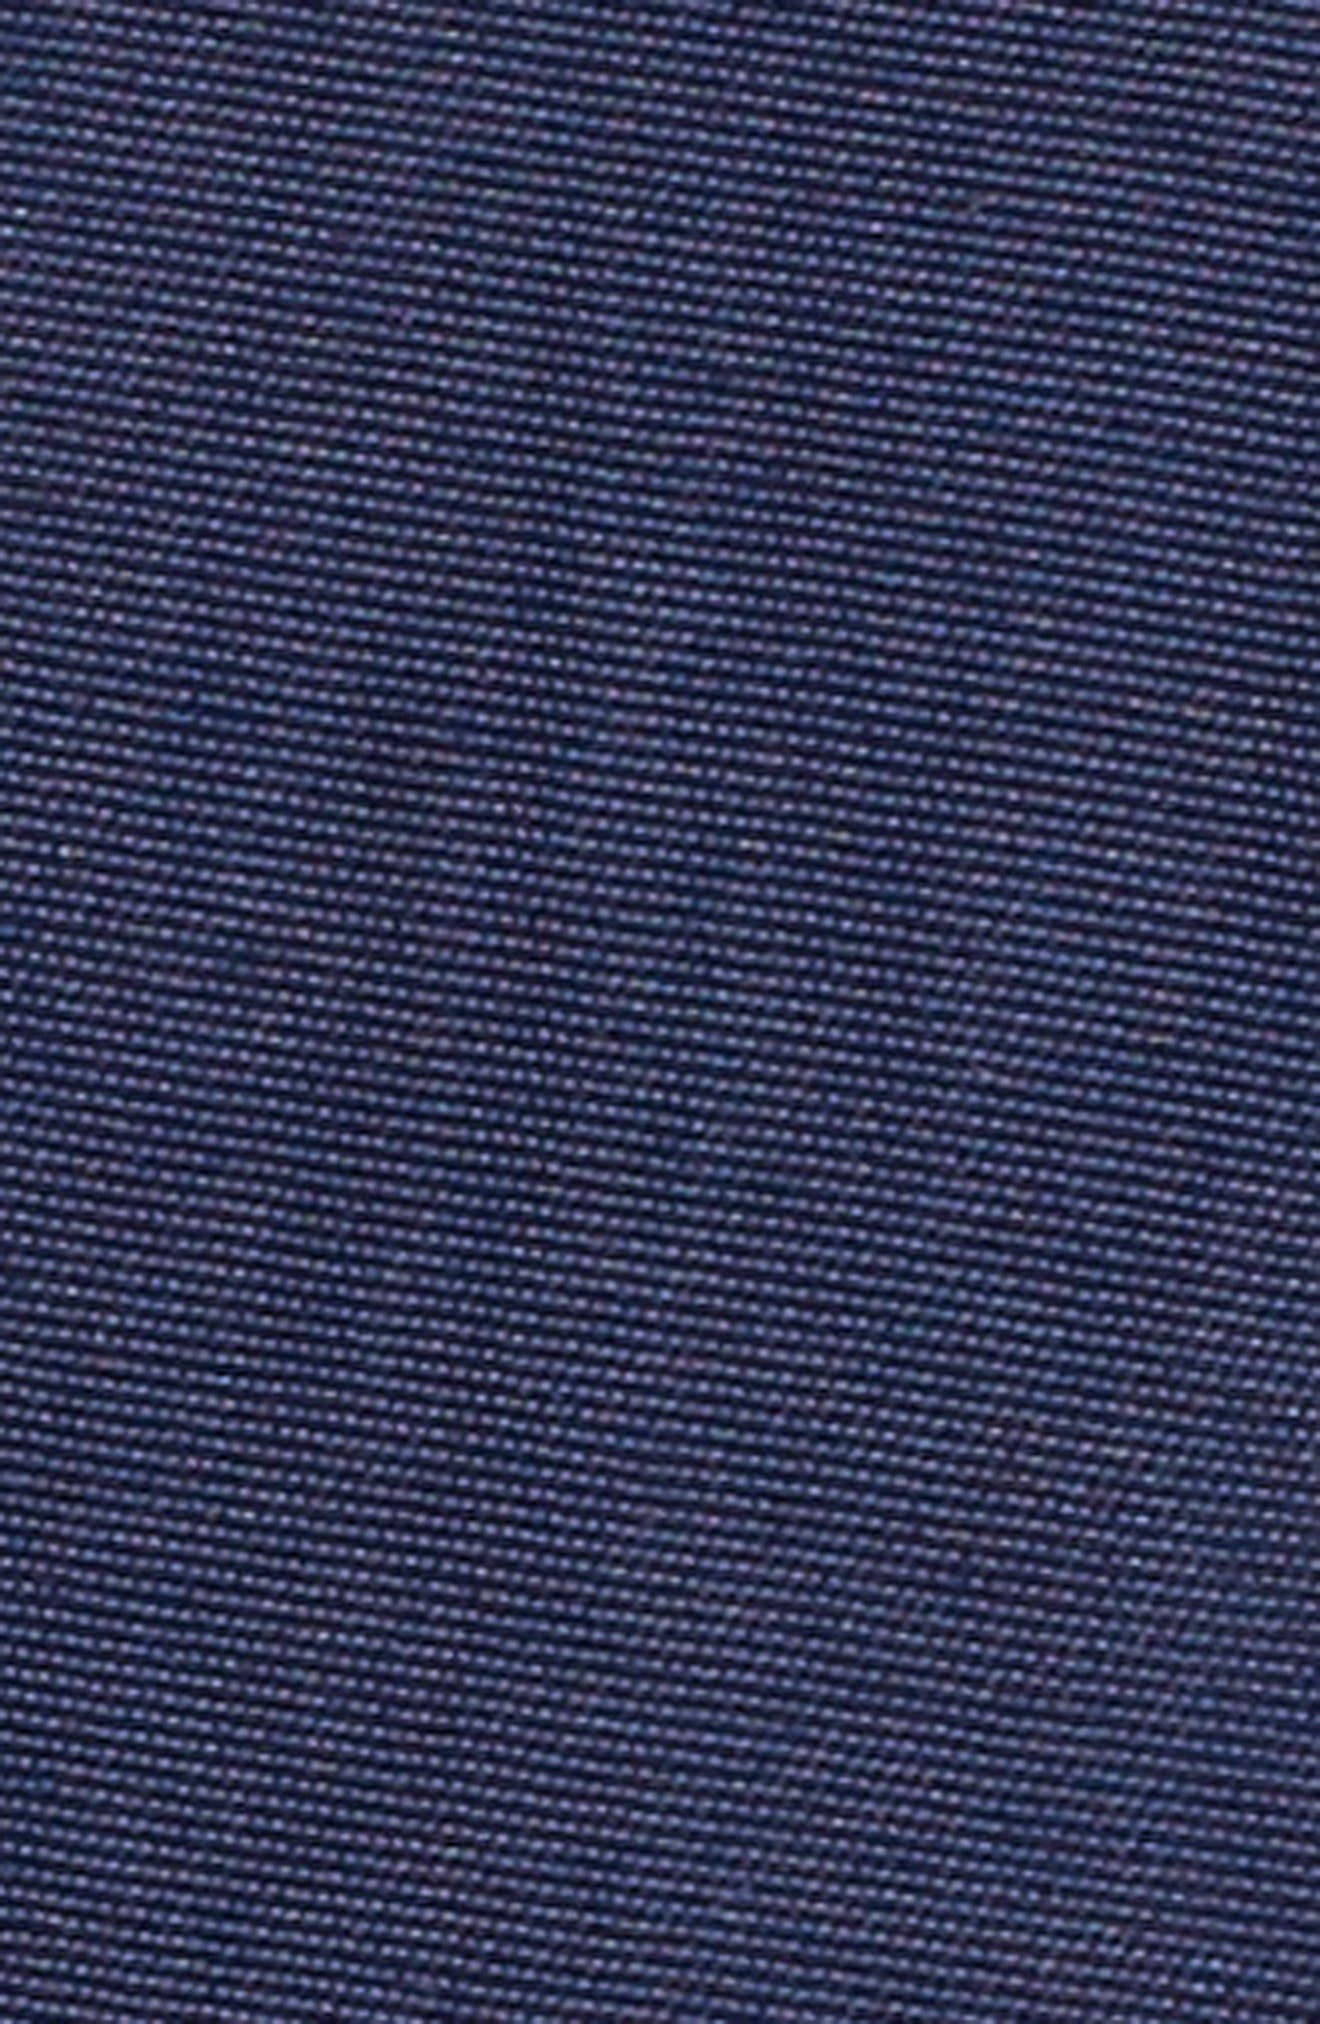 Aruba Tailored Fit 8.5 Inch Swim Trunks,                             Alternate thumbnail 6, color,                             415